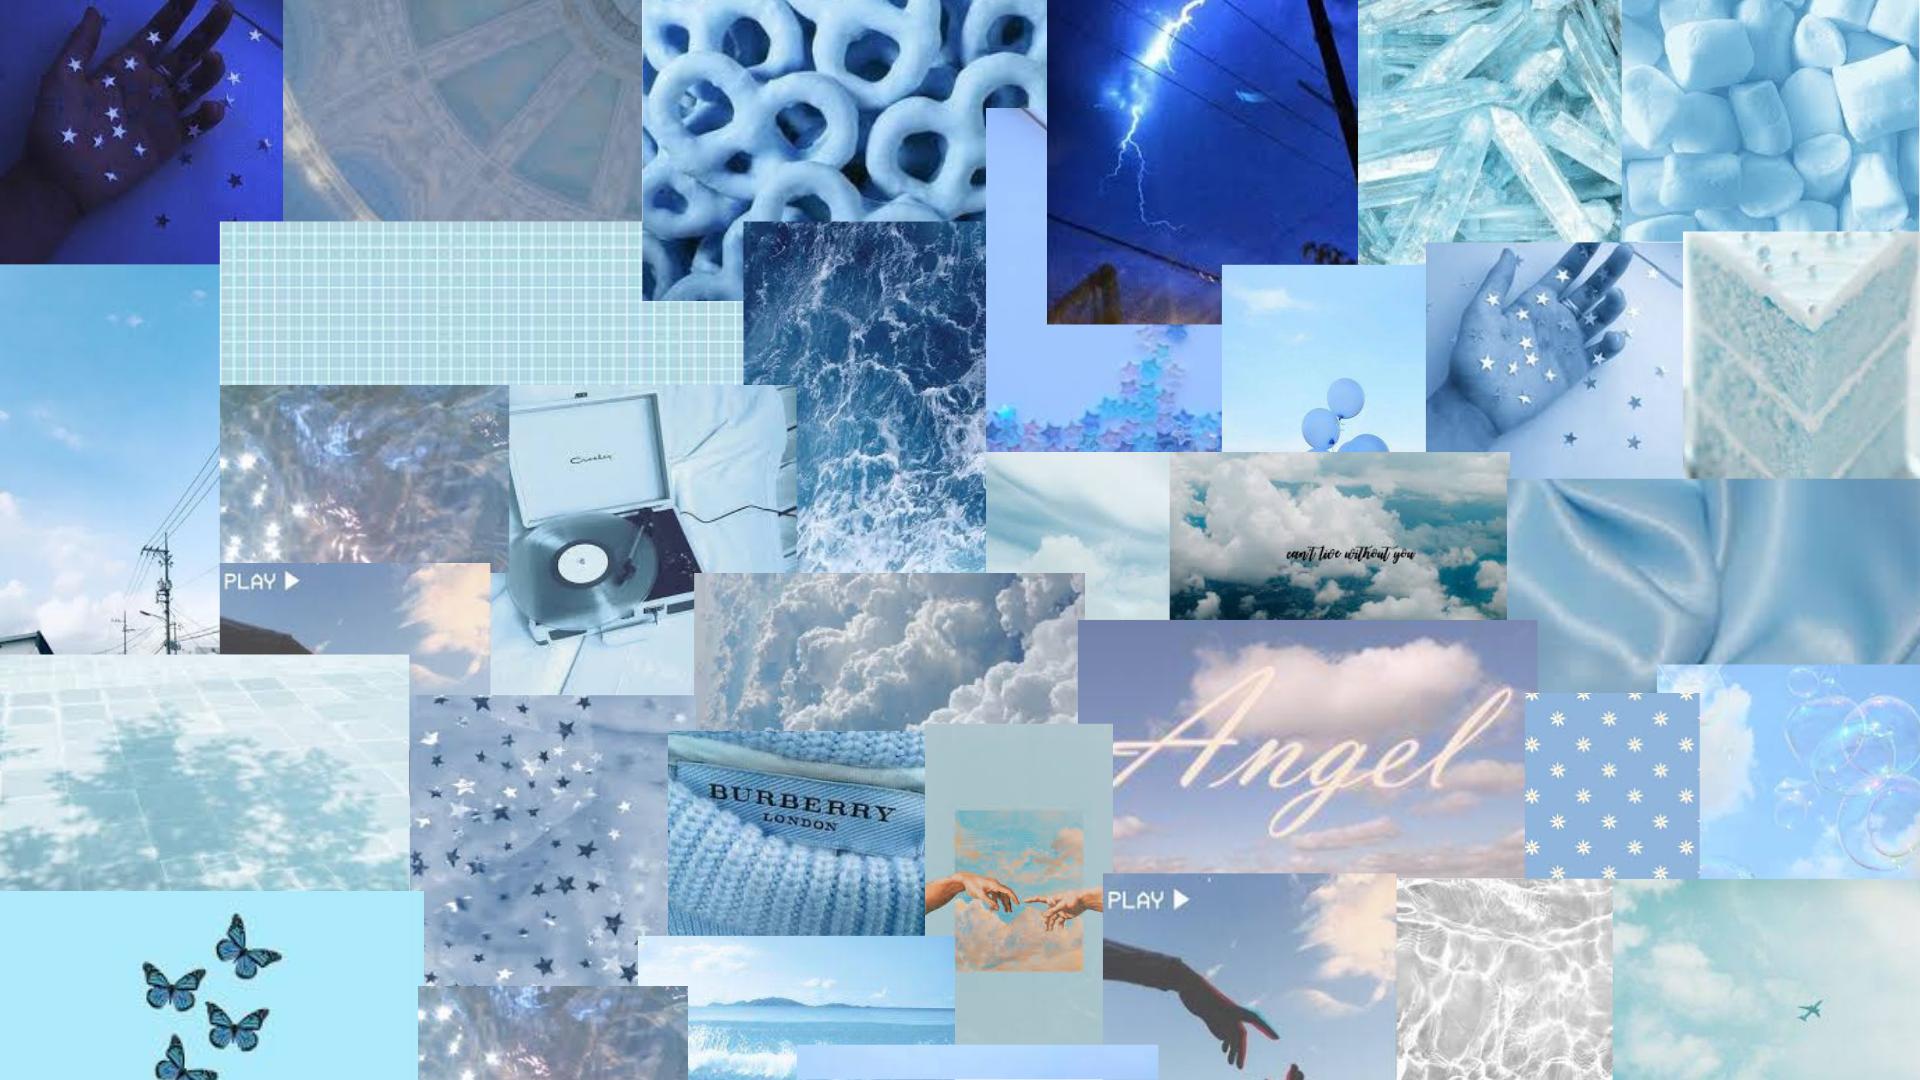 Blue Aesthetic Collage Wallpaper For Mac In 2021 Baby Blue Wallpaper Pastel Iphone Wallpaper Aesthetic Desktop Wallpaper